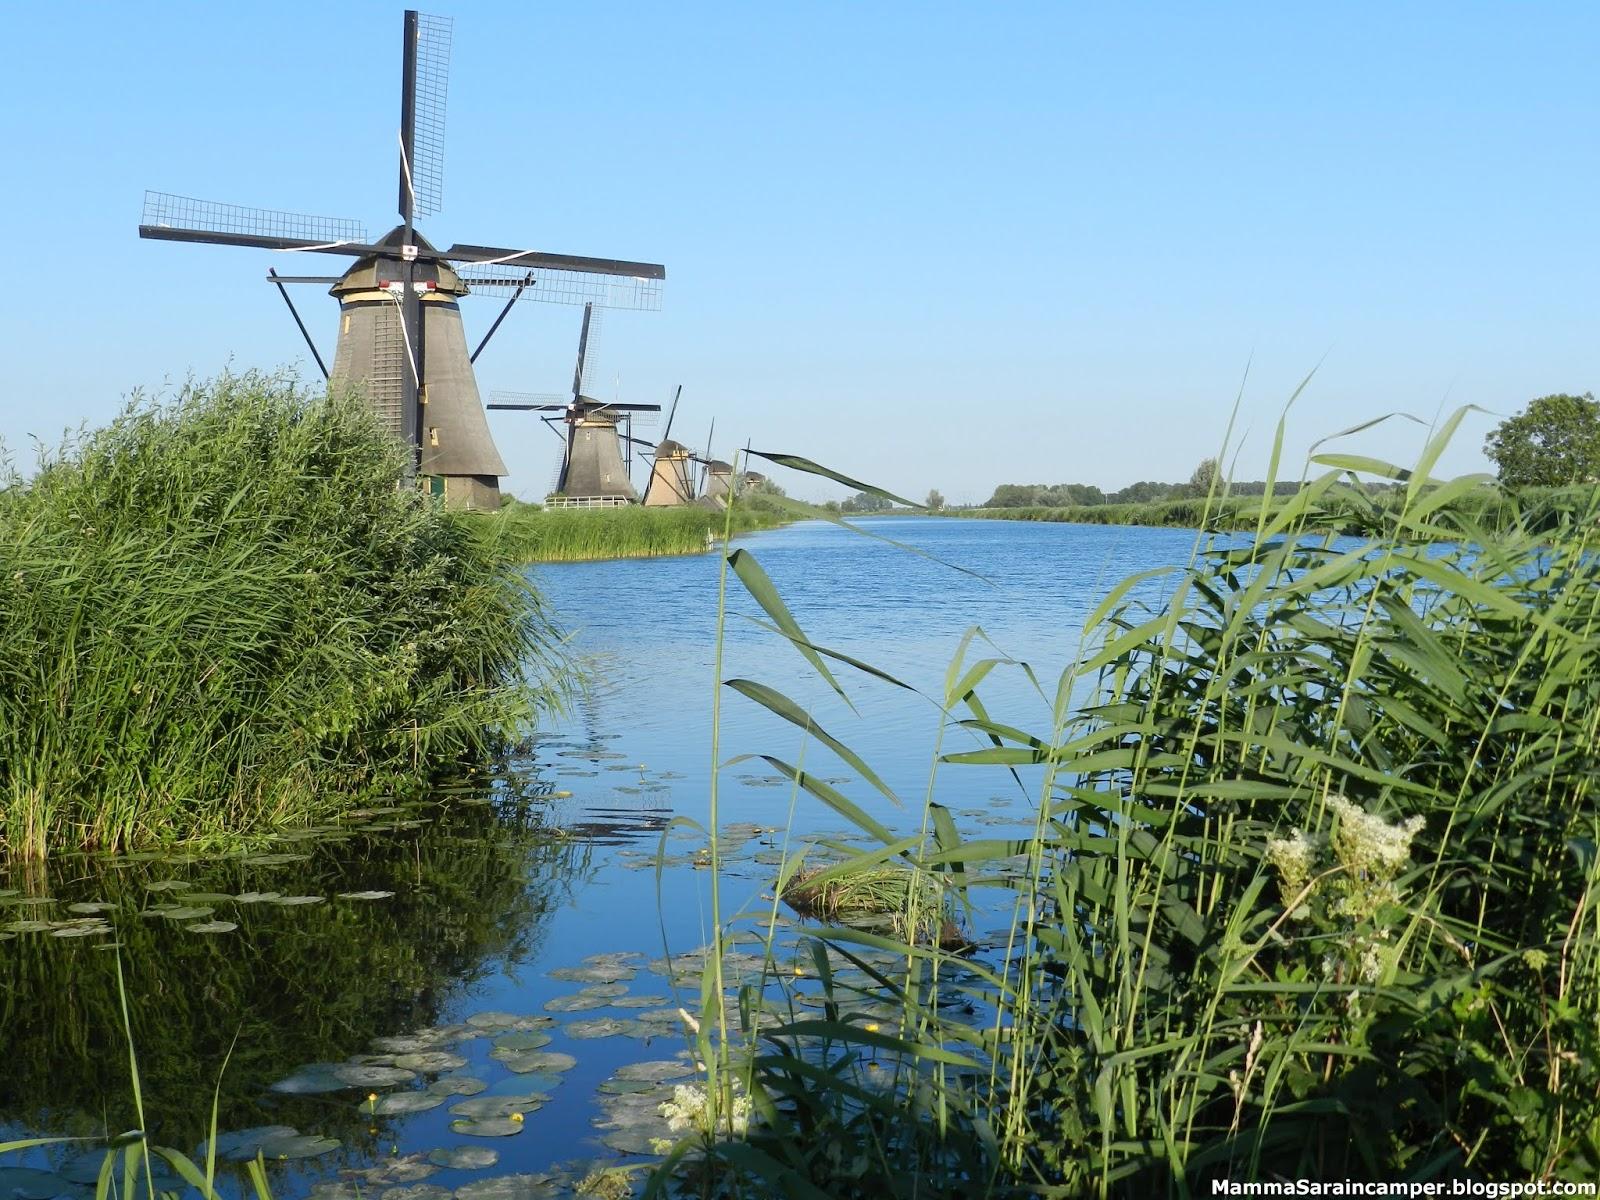 Vendita Case In Olanda mammasaraincamper : olanda 2018: i nostri preferiti